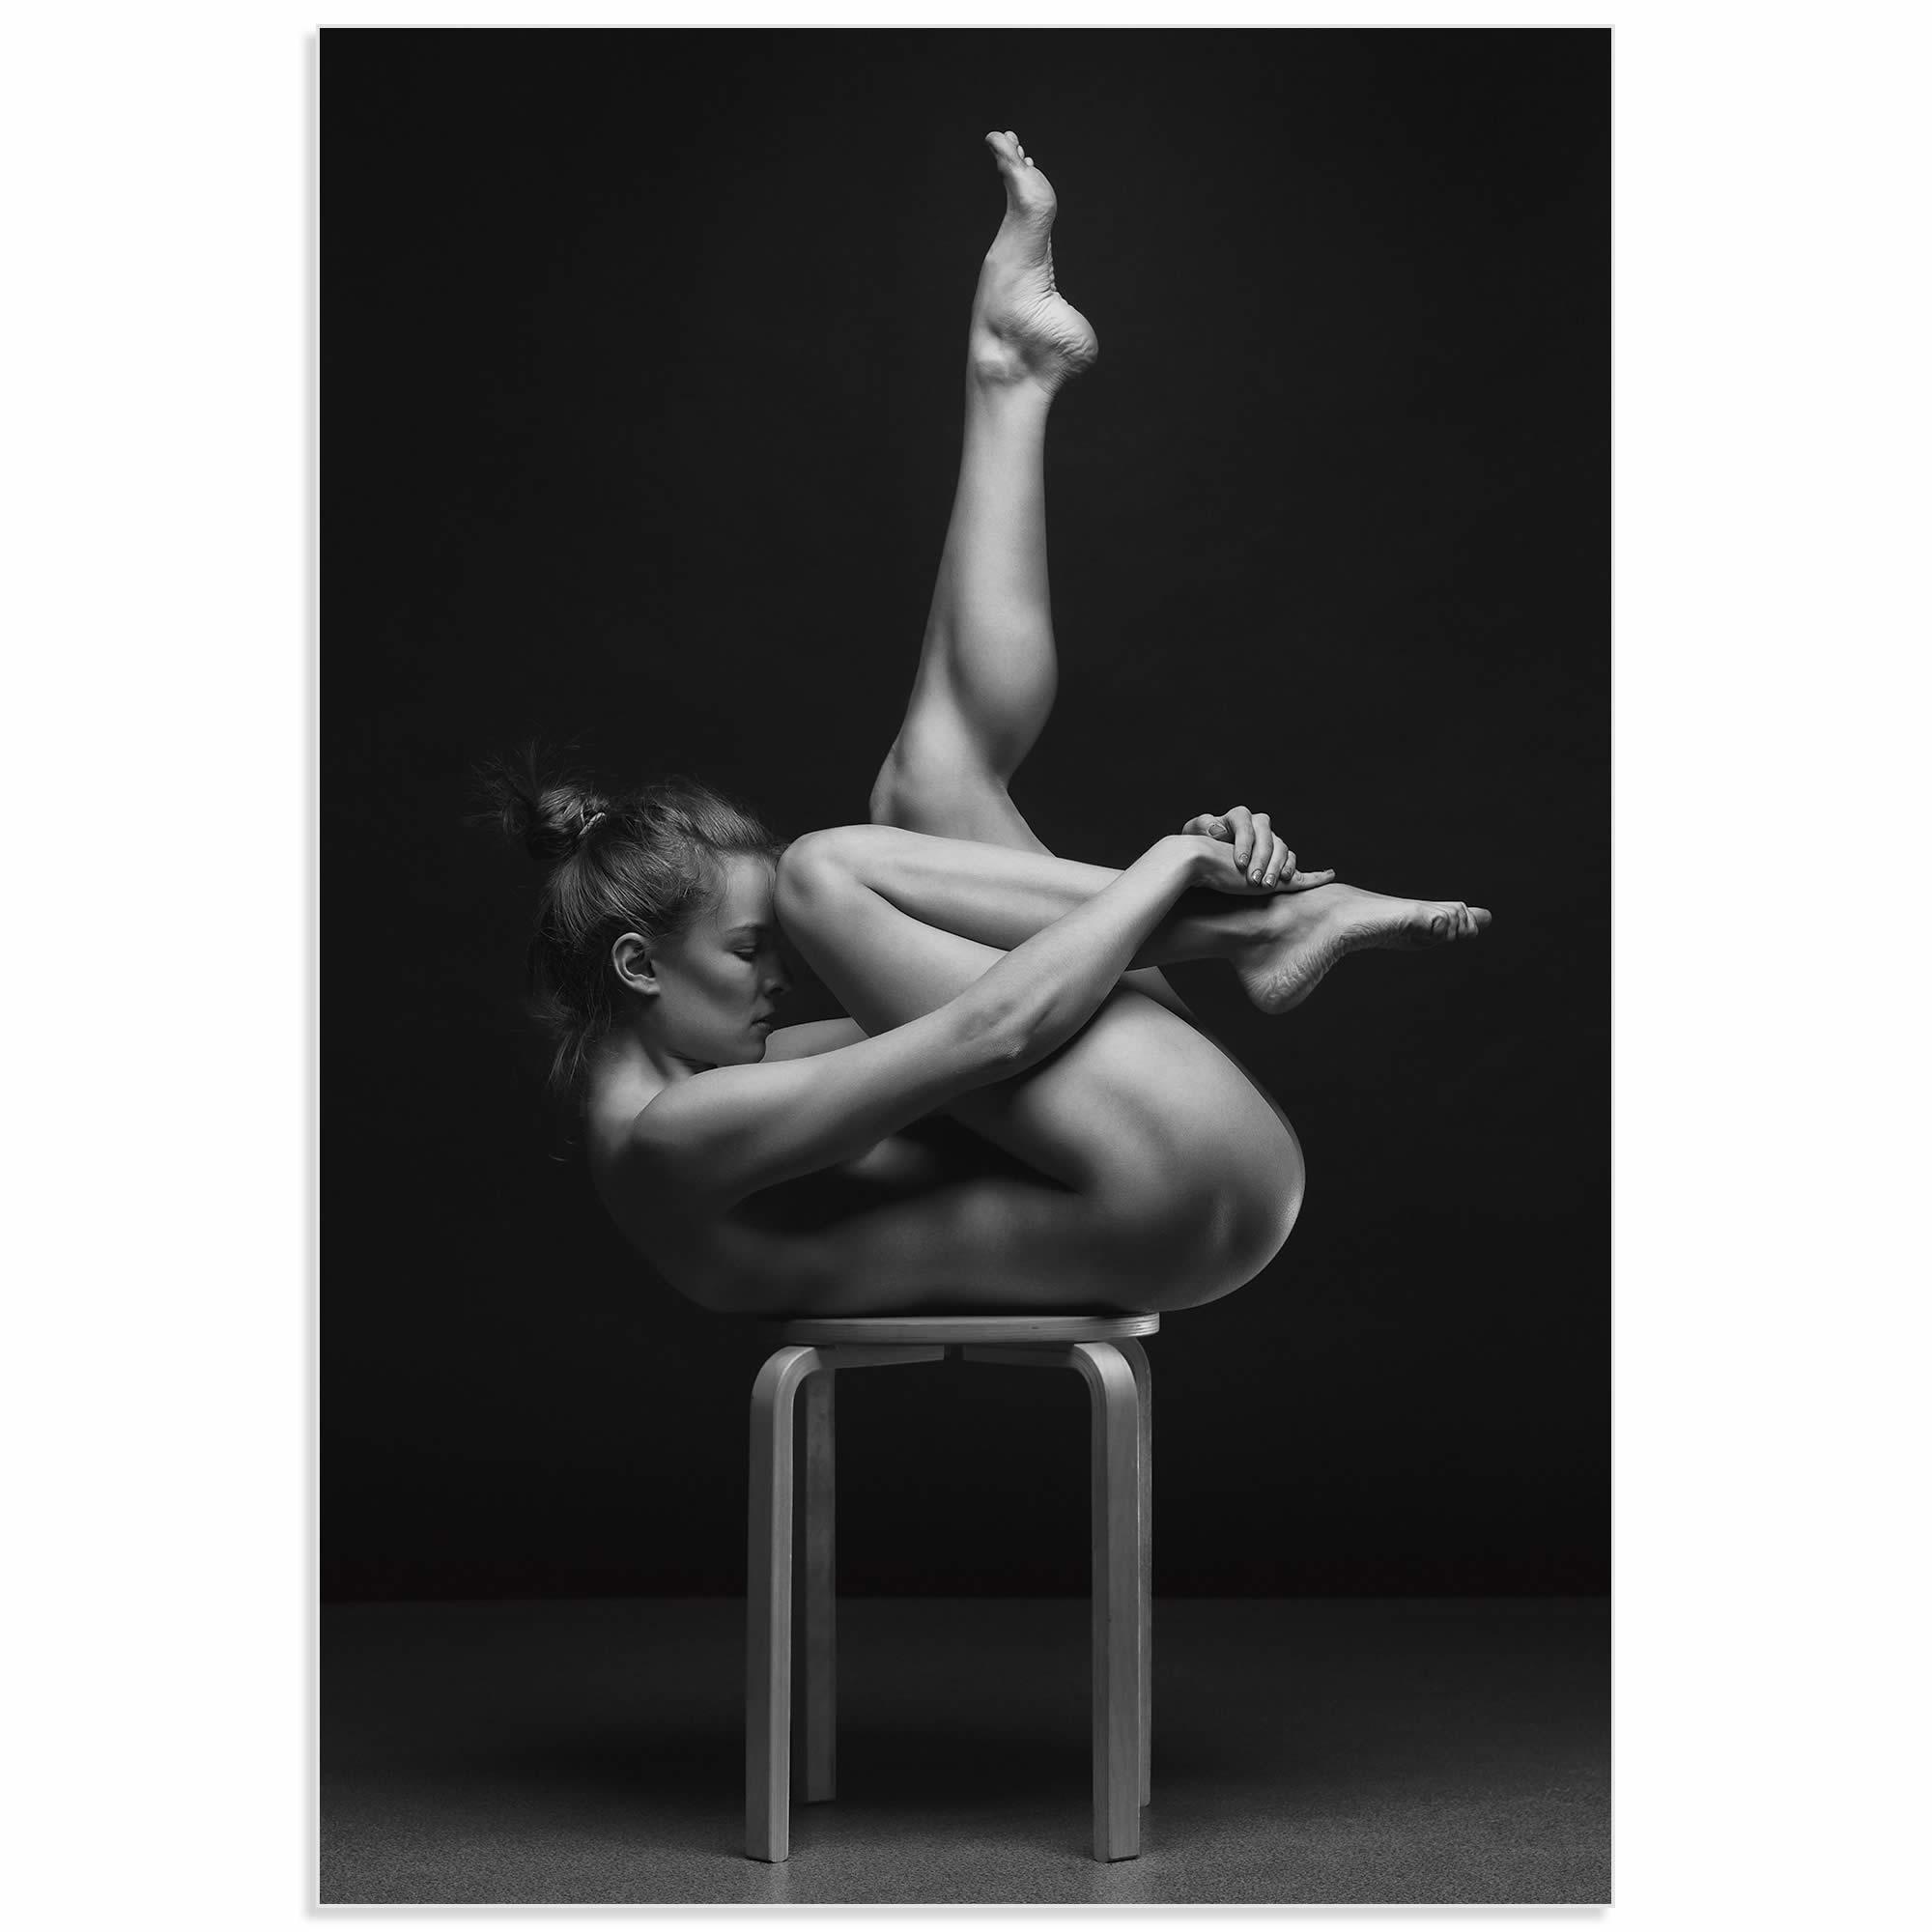 Emerging by Anton Belovodchenko - Abstract Nude Art on Acrylic 581b4890e2246111ce63aaae